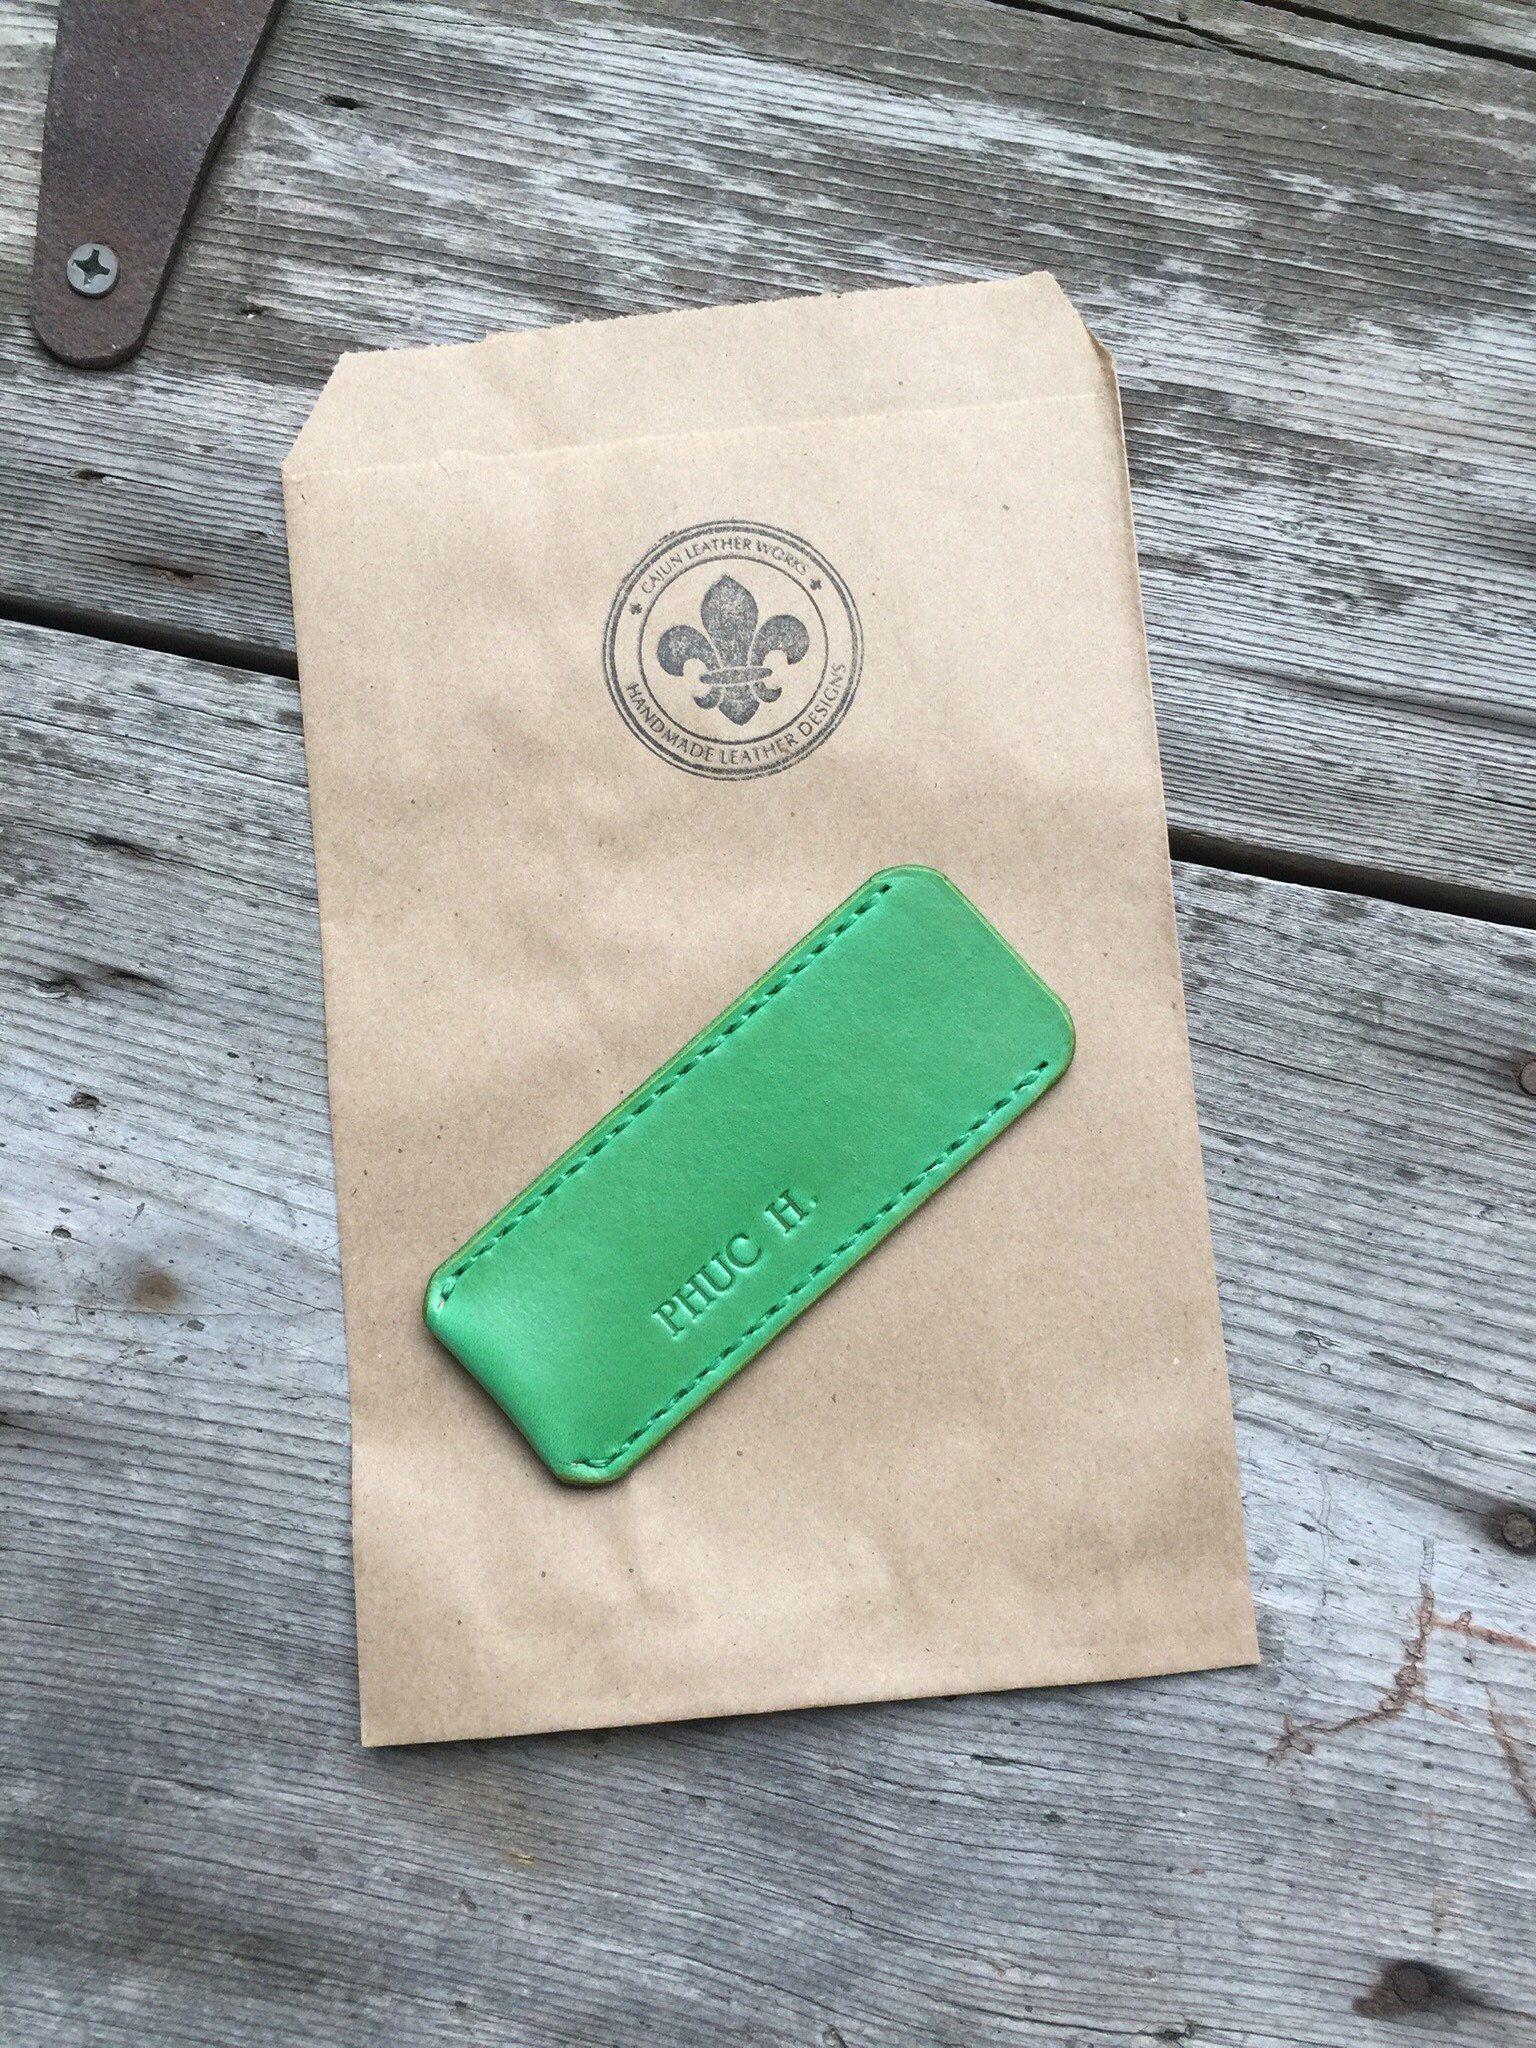 1899ab66ff9e0 Minimalist Veg Tanned Leather Pocket Knife Sheath / Knife Slip ...